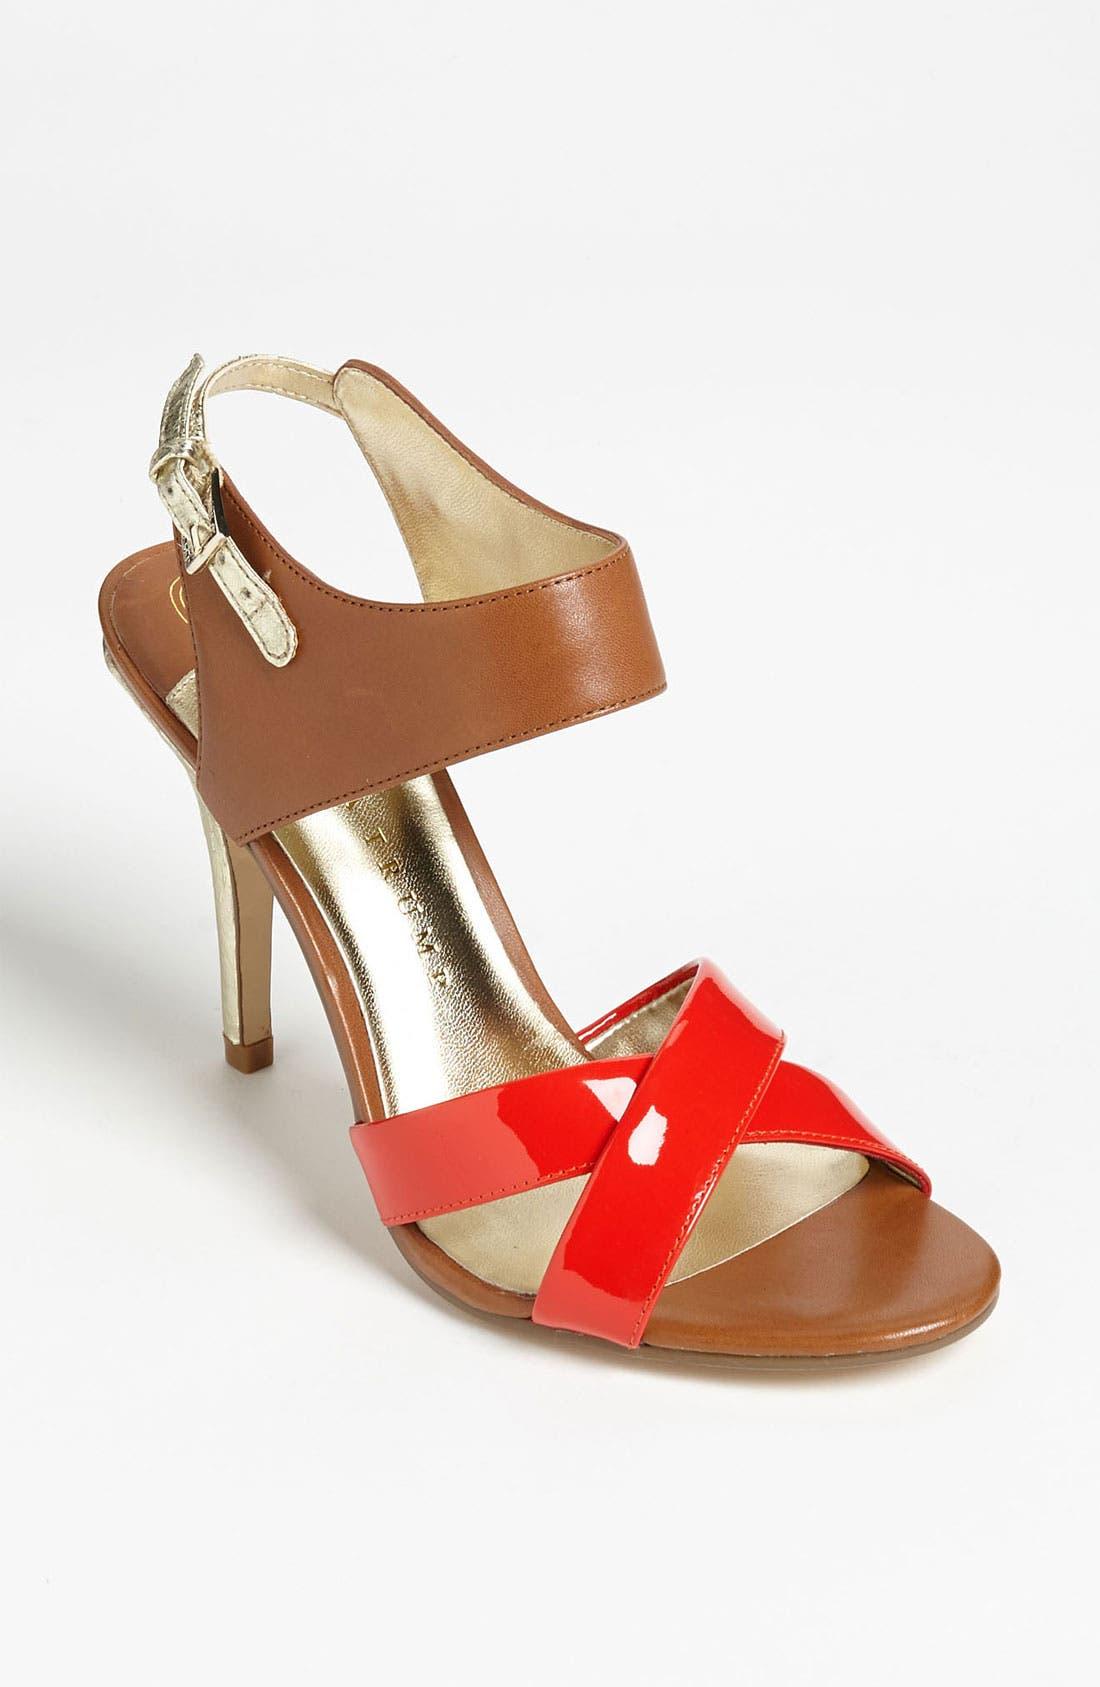 Alternate Image 1 Selected - Ivanka Trump 'Meada' Sandal